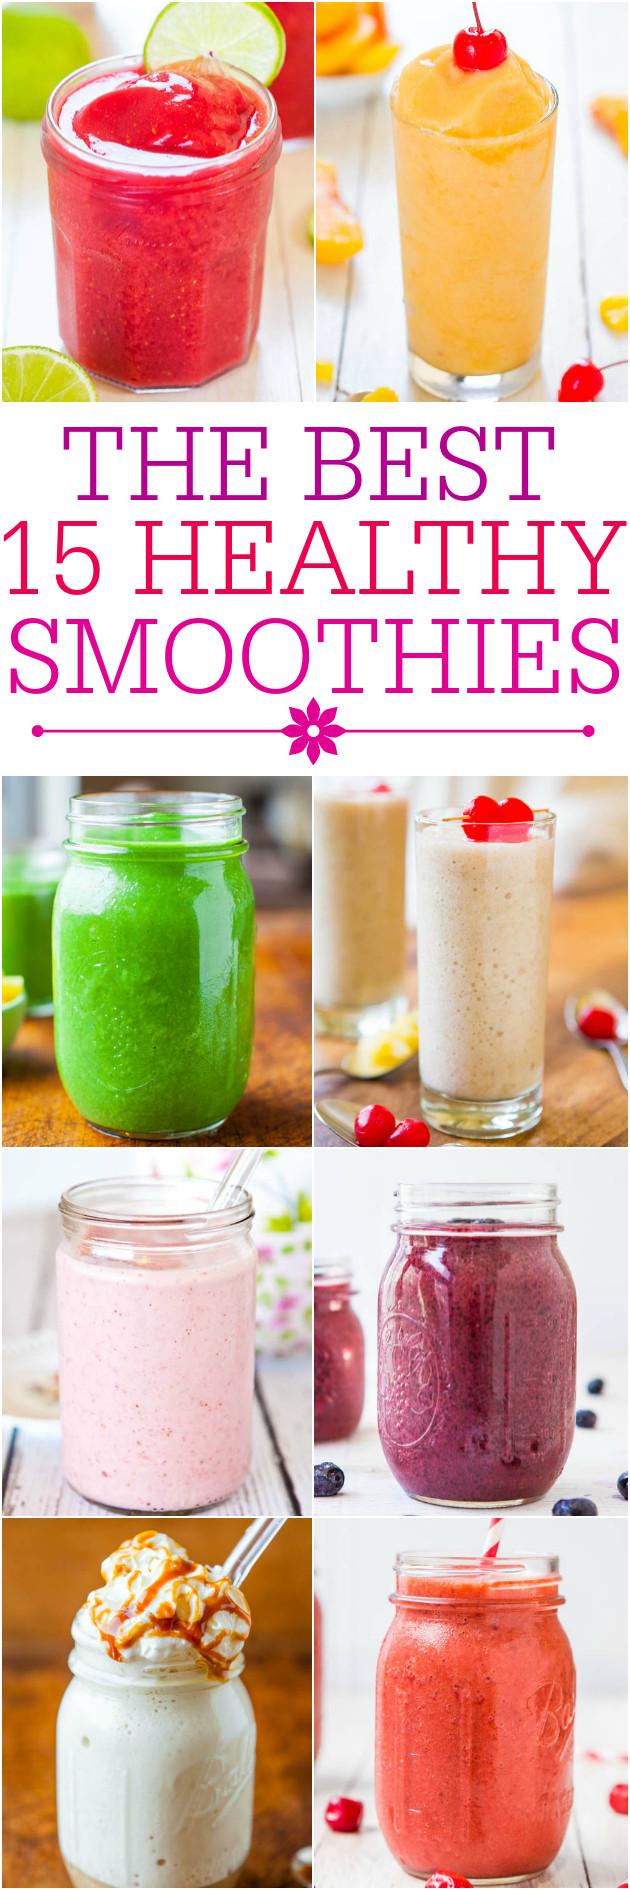 Delicious Smoothie Recipes  Frozen Fruit Smoothie with Yogurt 3 Ingre nts